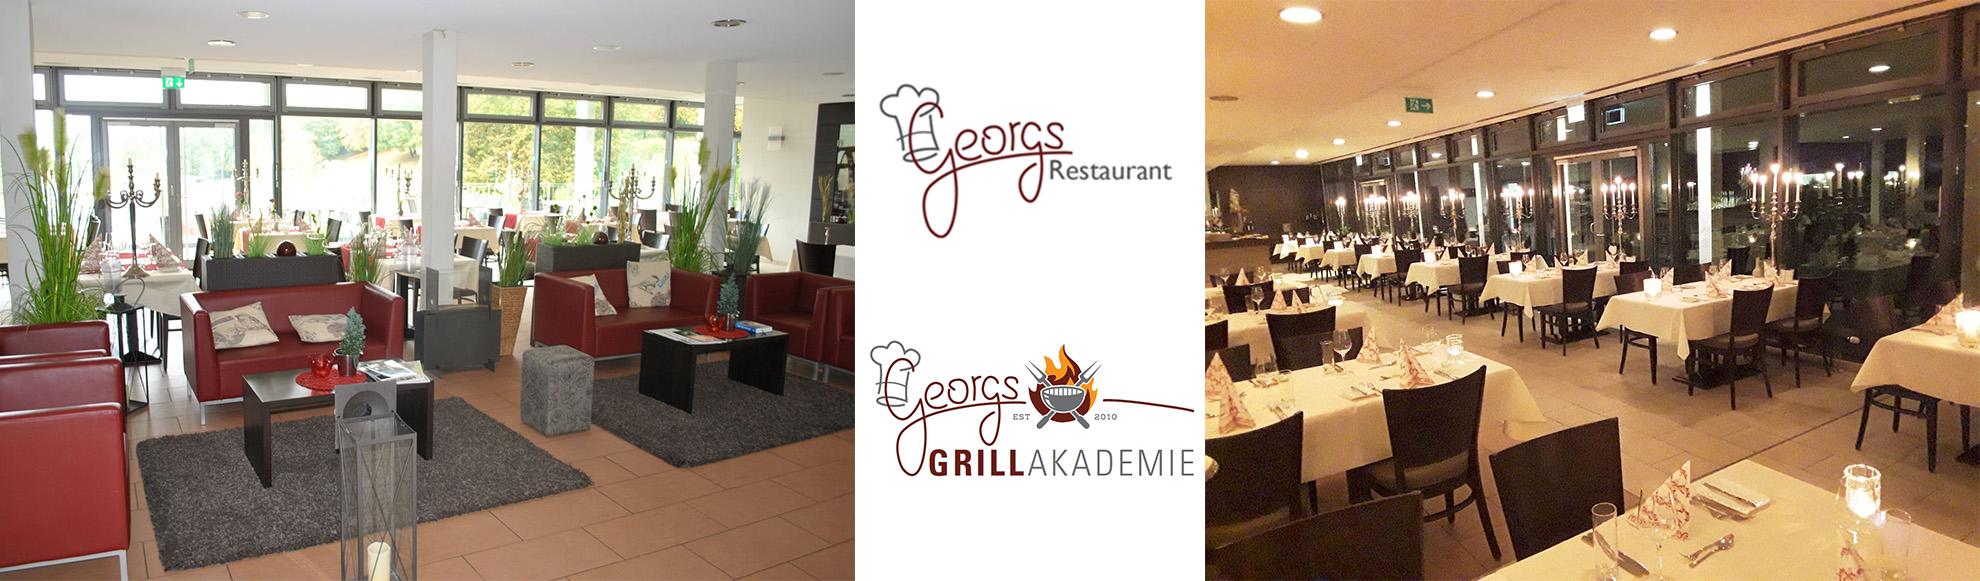 Georgs Restaurant